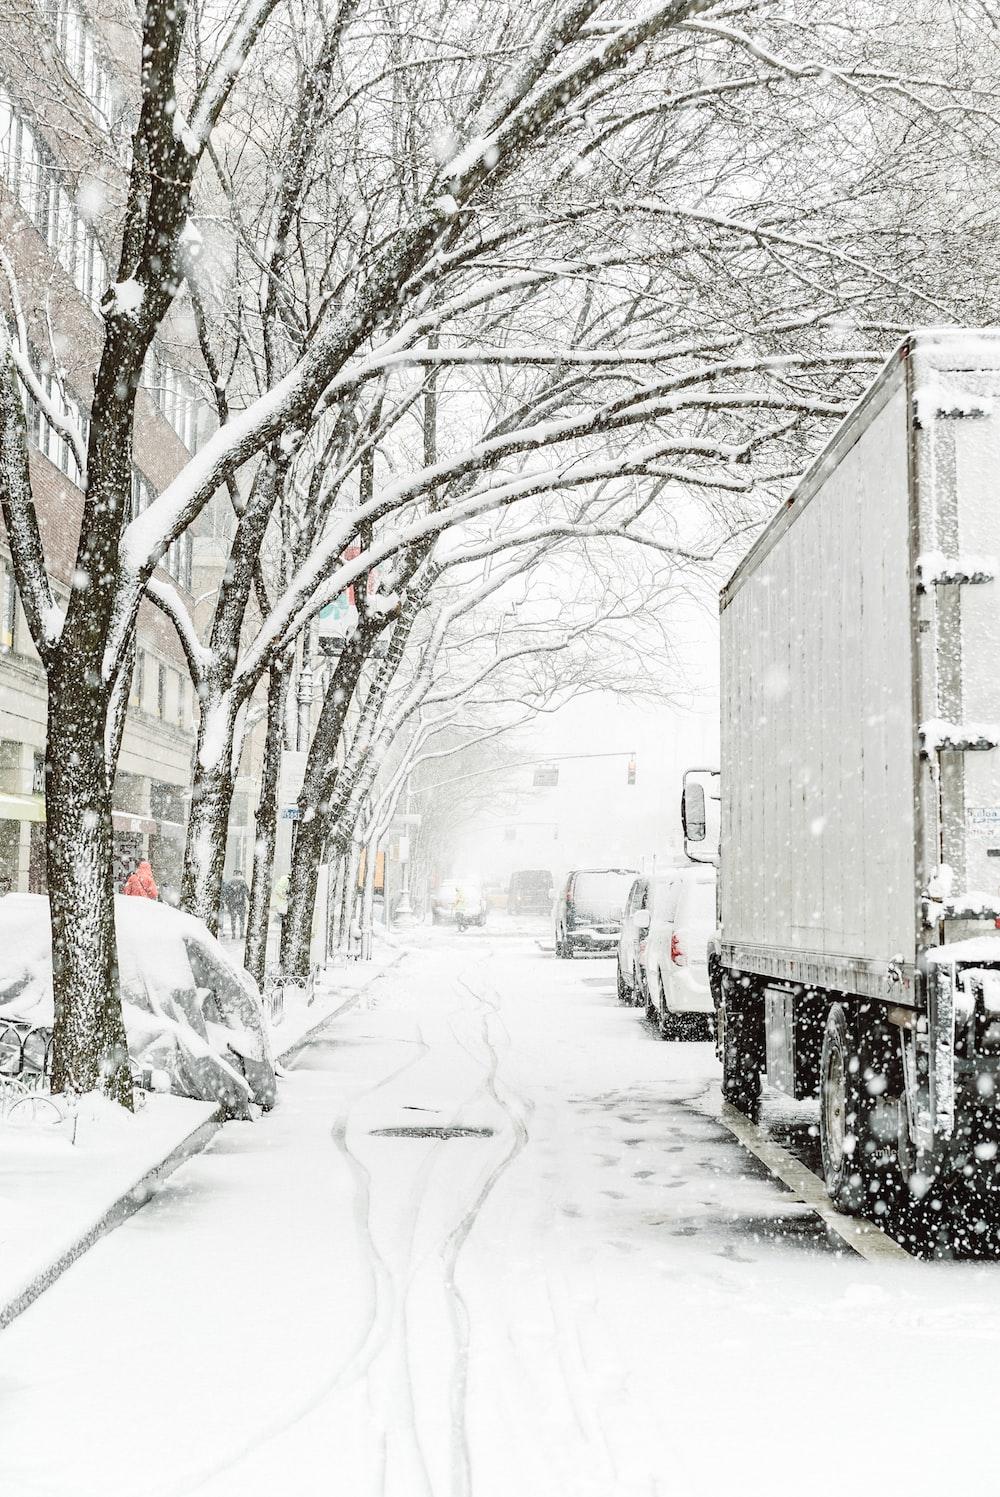 gray truck on snowy road